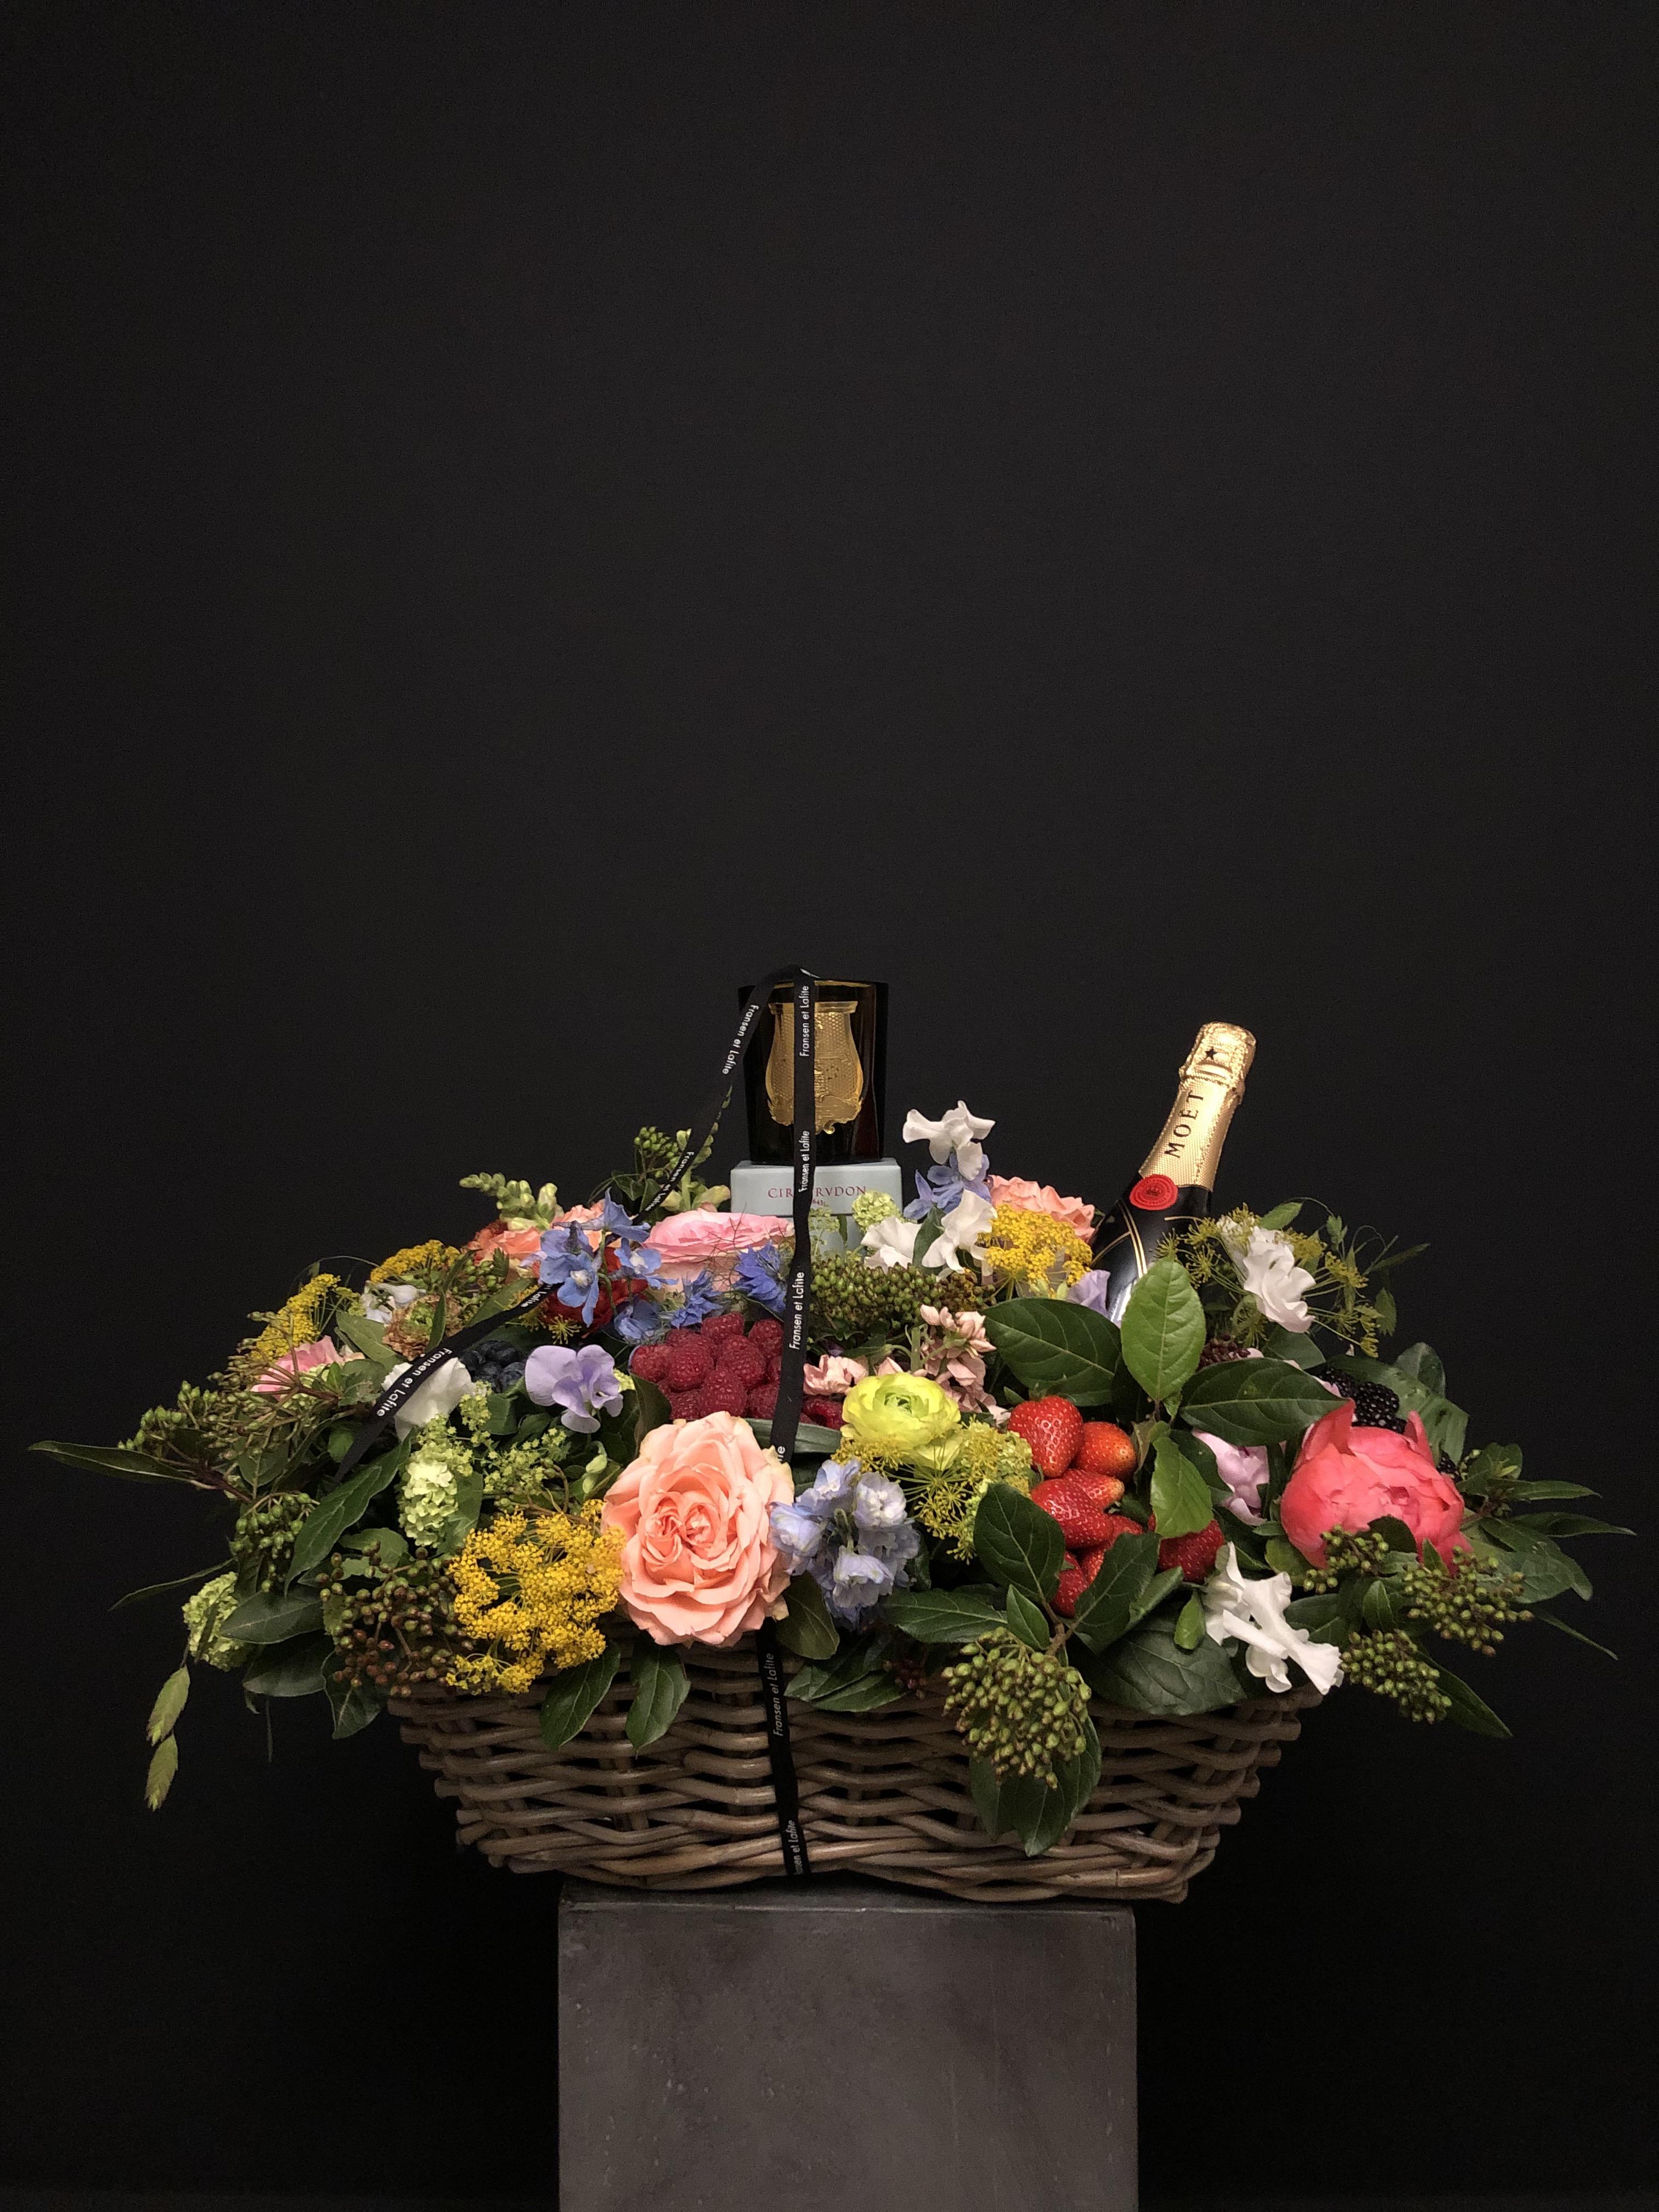 Cesta XL con flores, frutas, champagne Moët Chandon y vela Cire Trudon